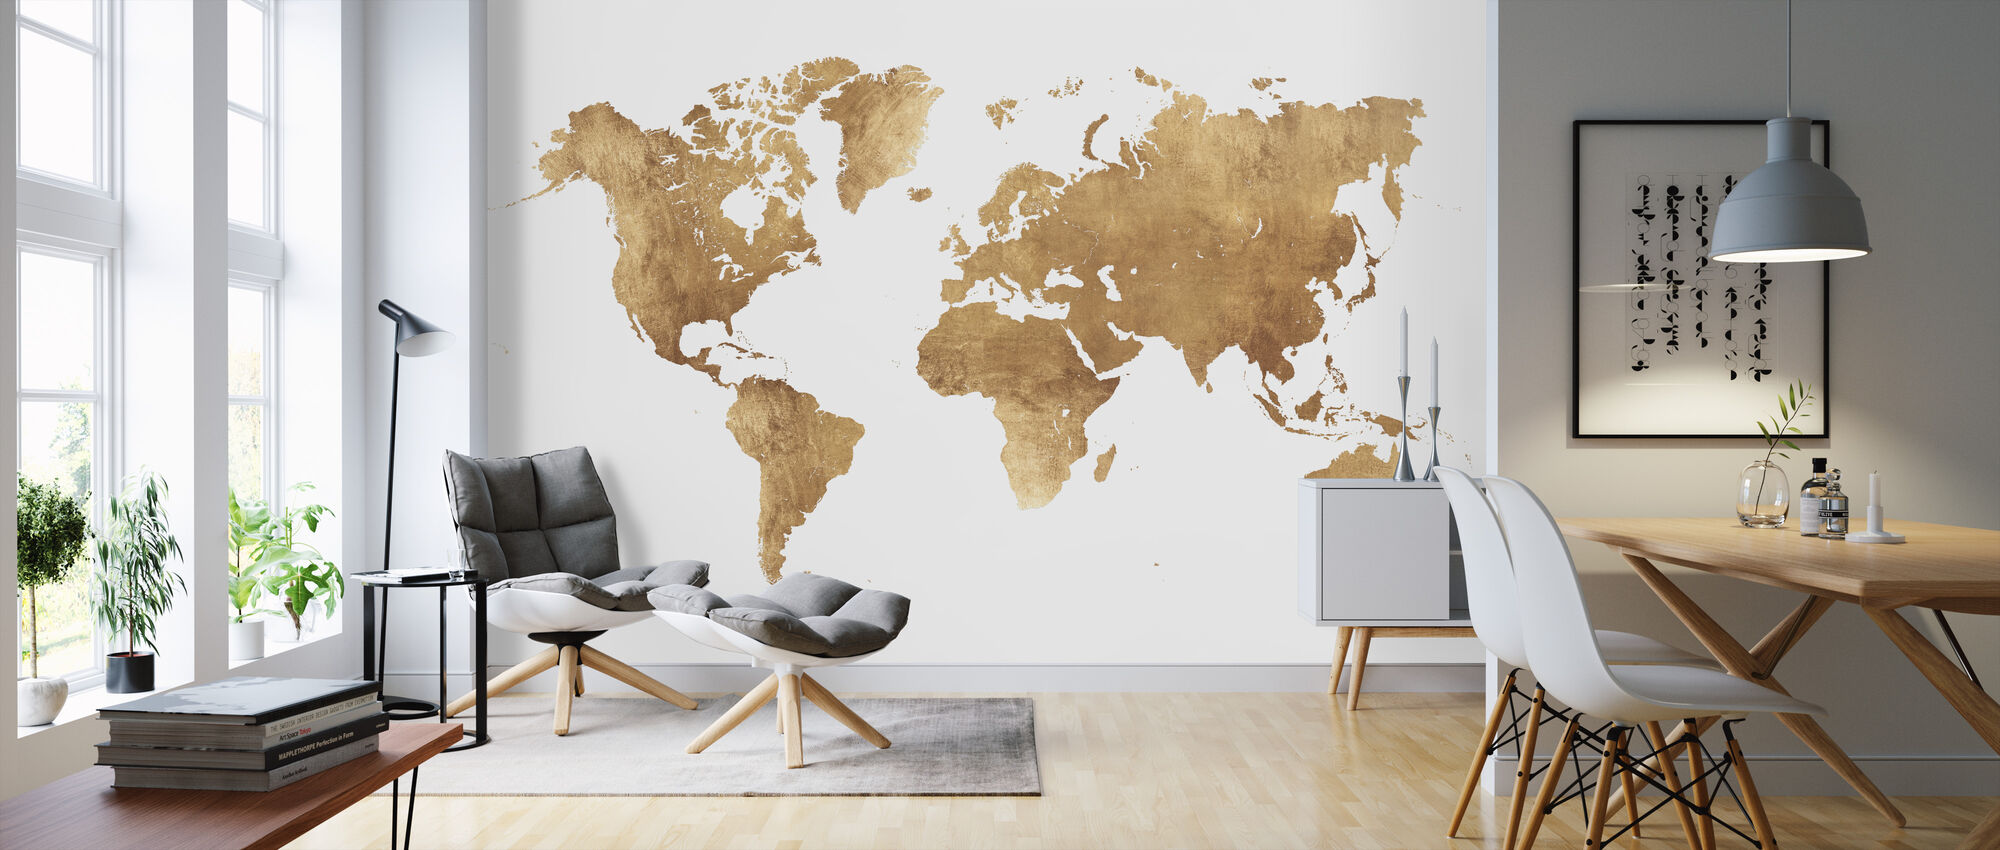 World Map Brushed Metal - Wallpaper - Living Room